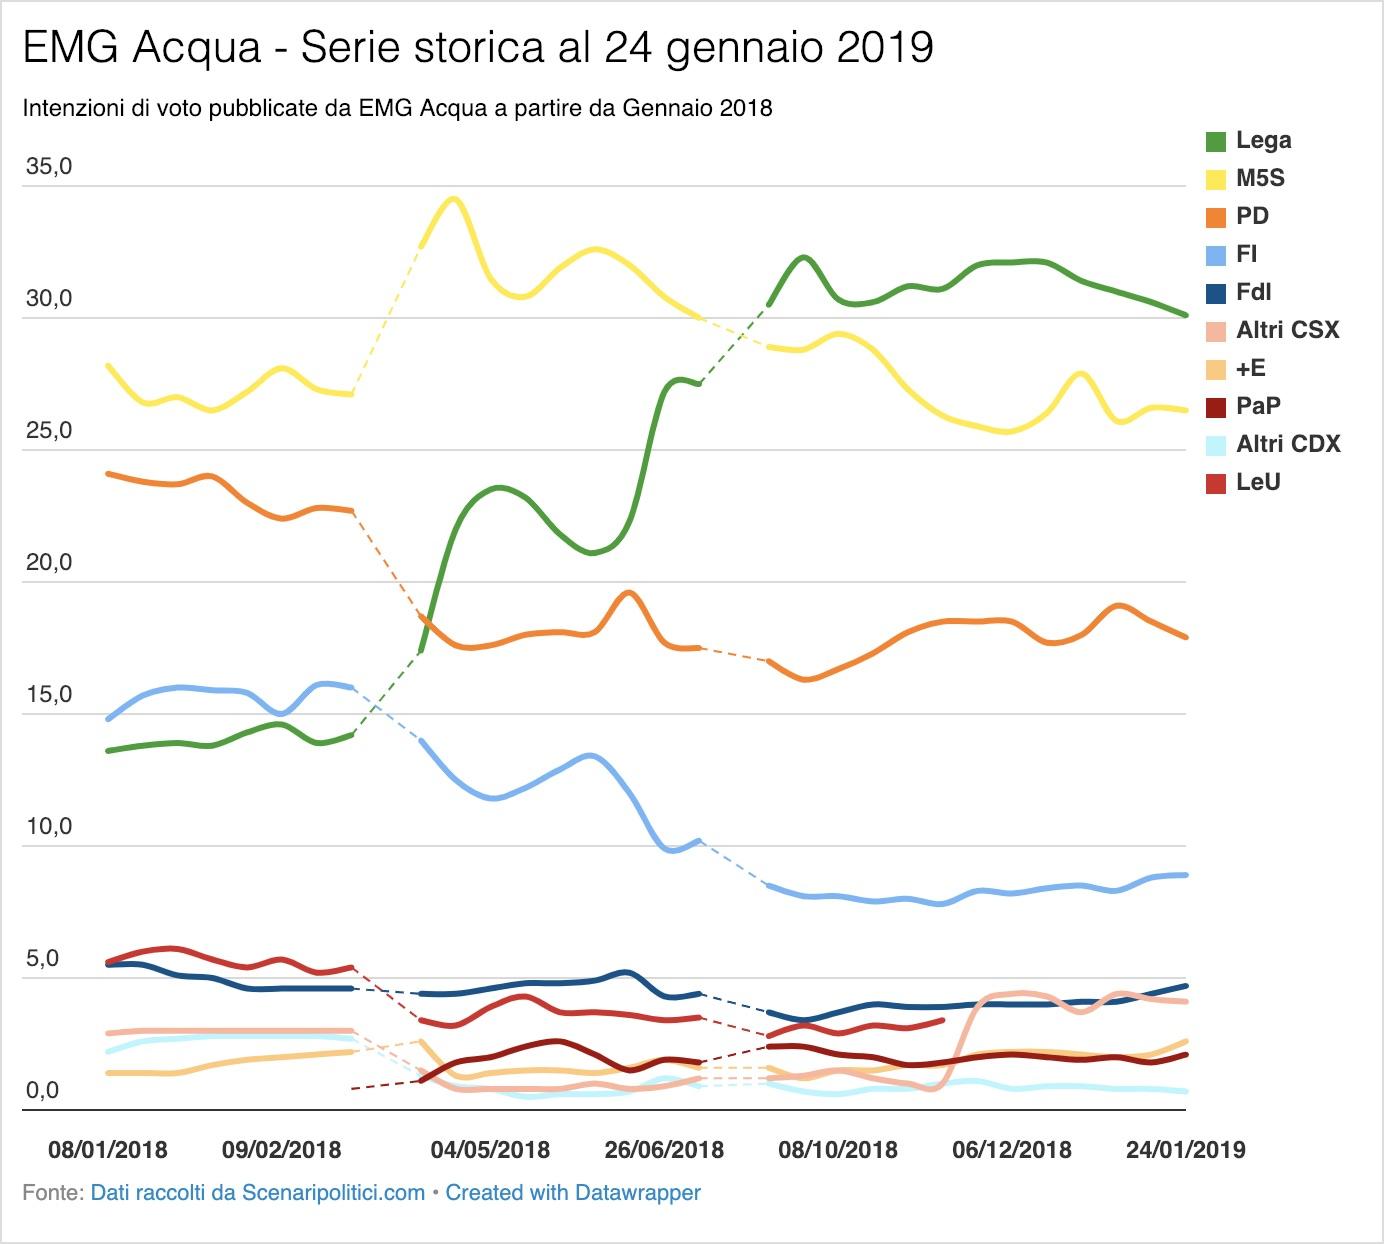 Sondaggio EMG Acqua 24 gennaio 2019